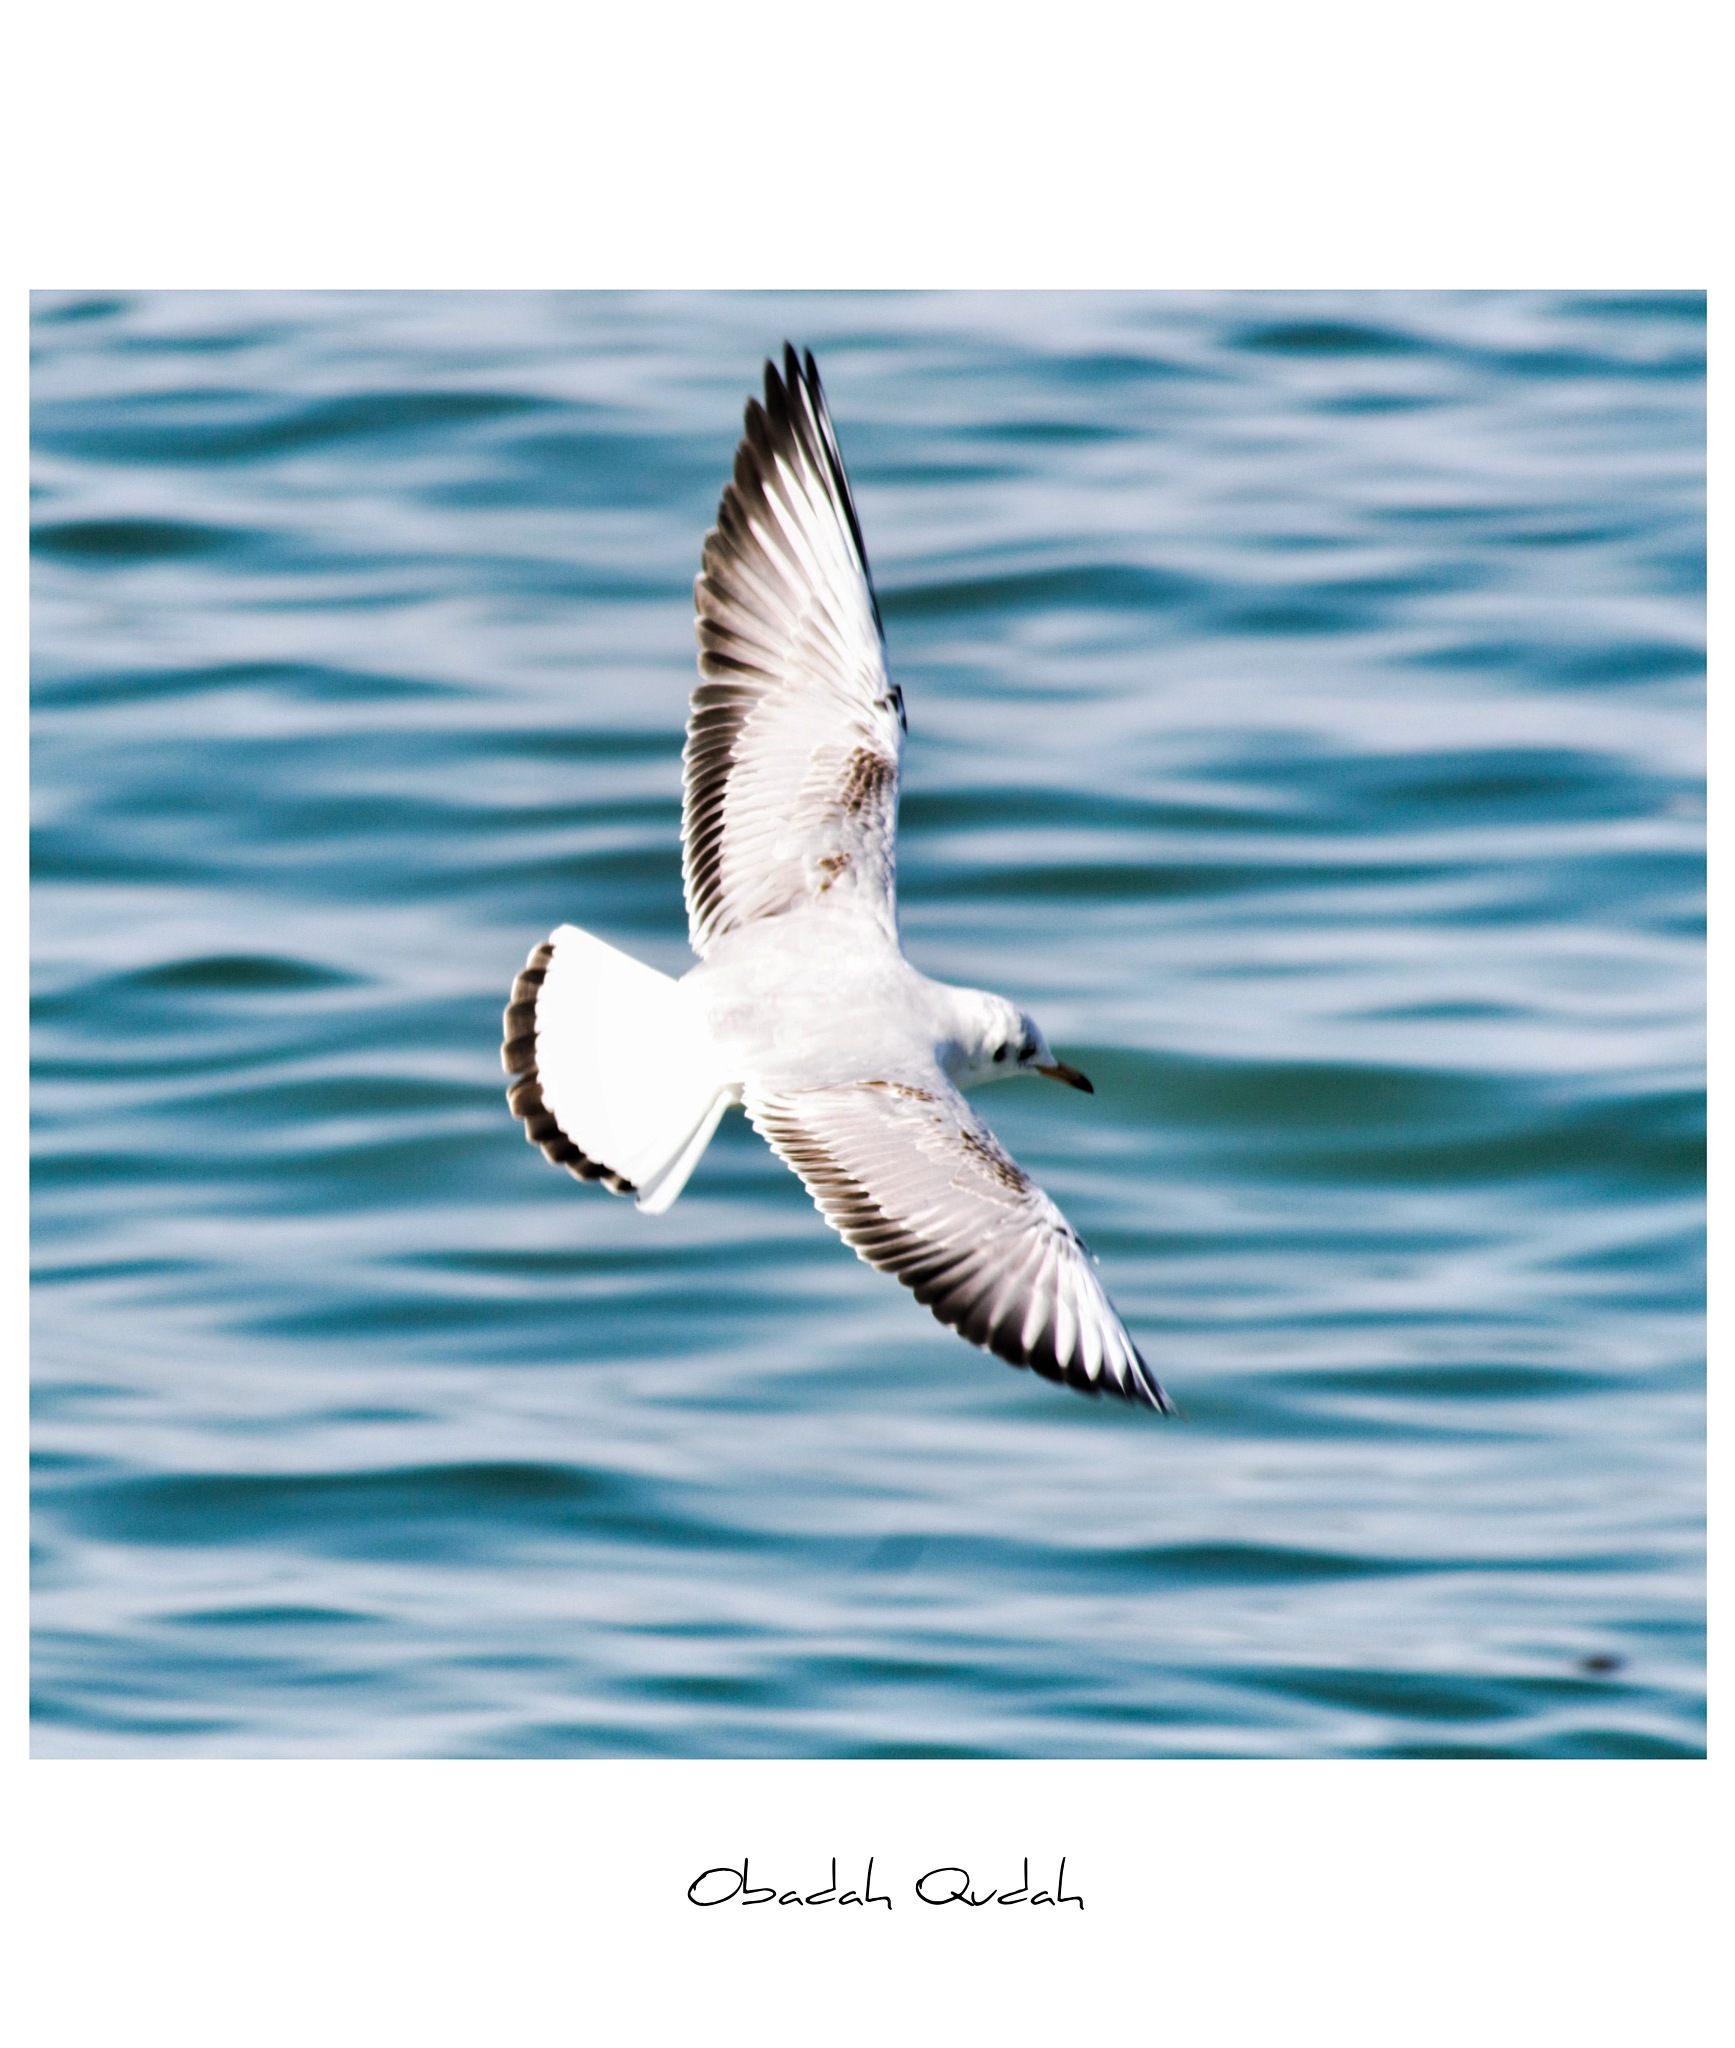 Seagull  by Obadah Qudah